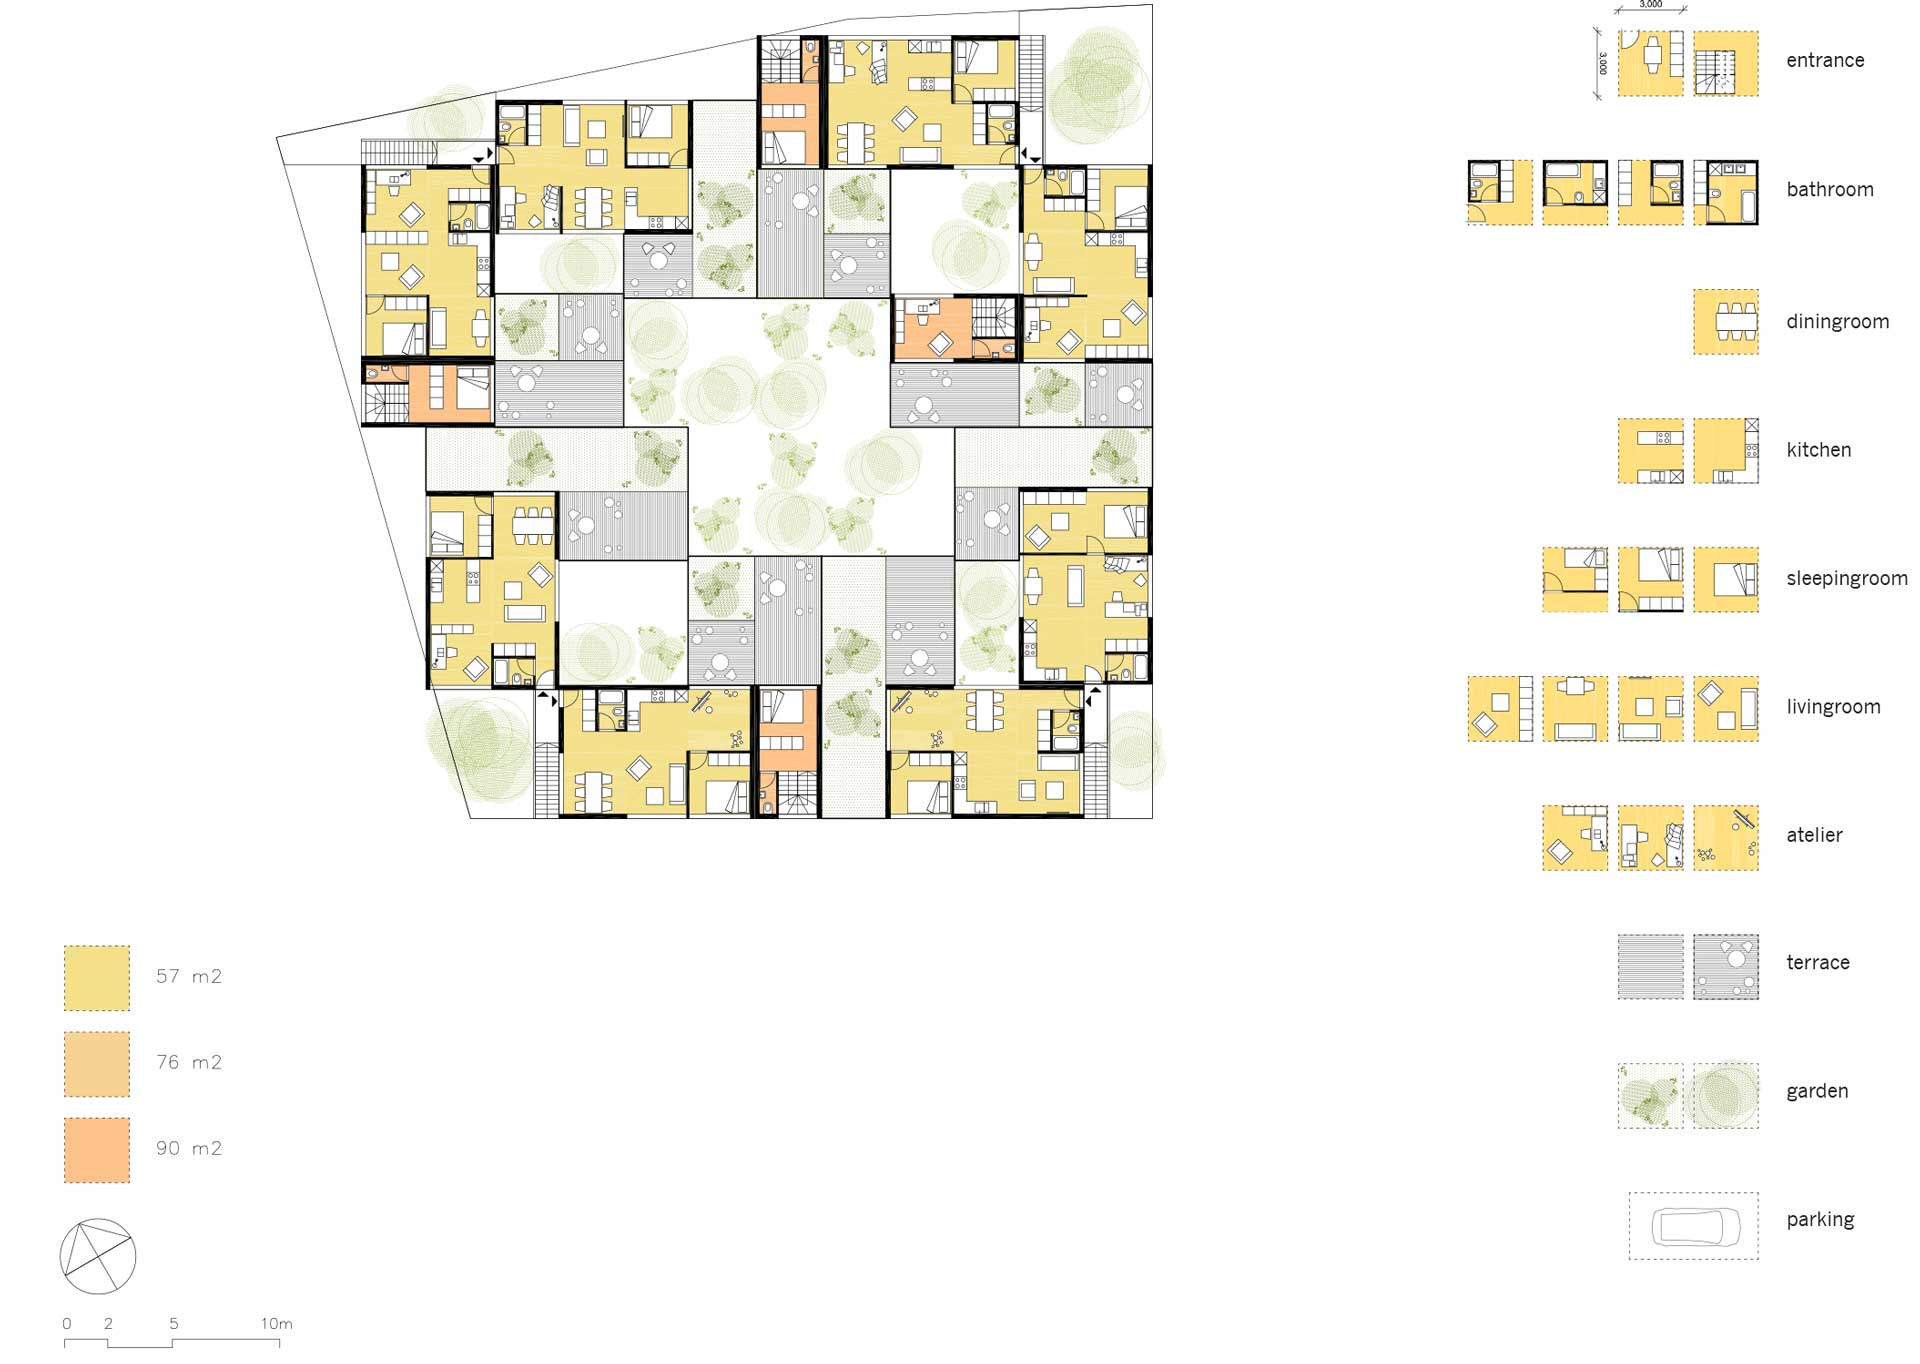 floorplan-legend-scale-ENG